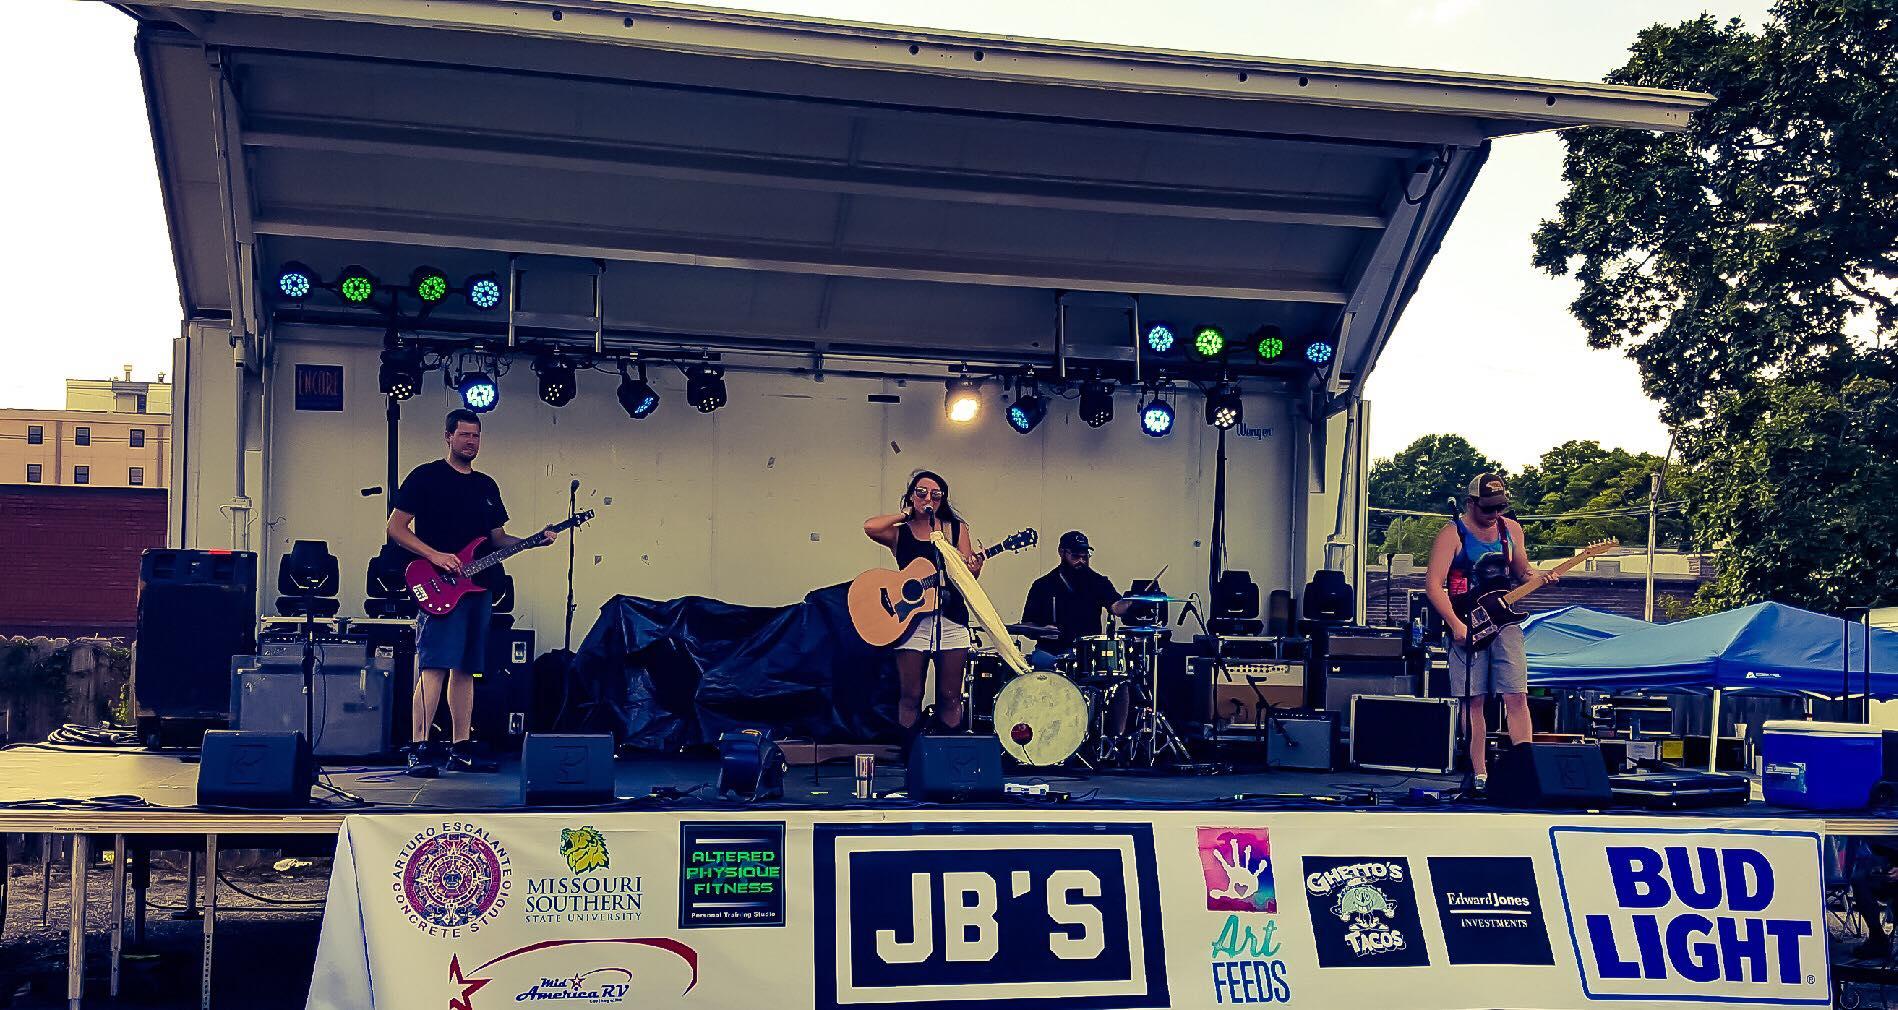 jbs show